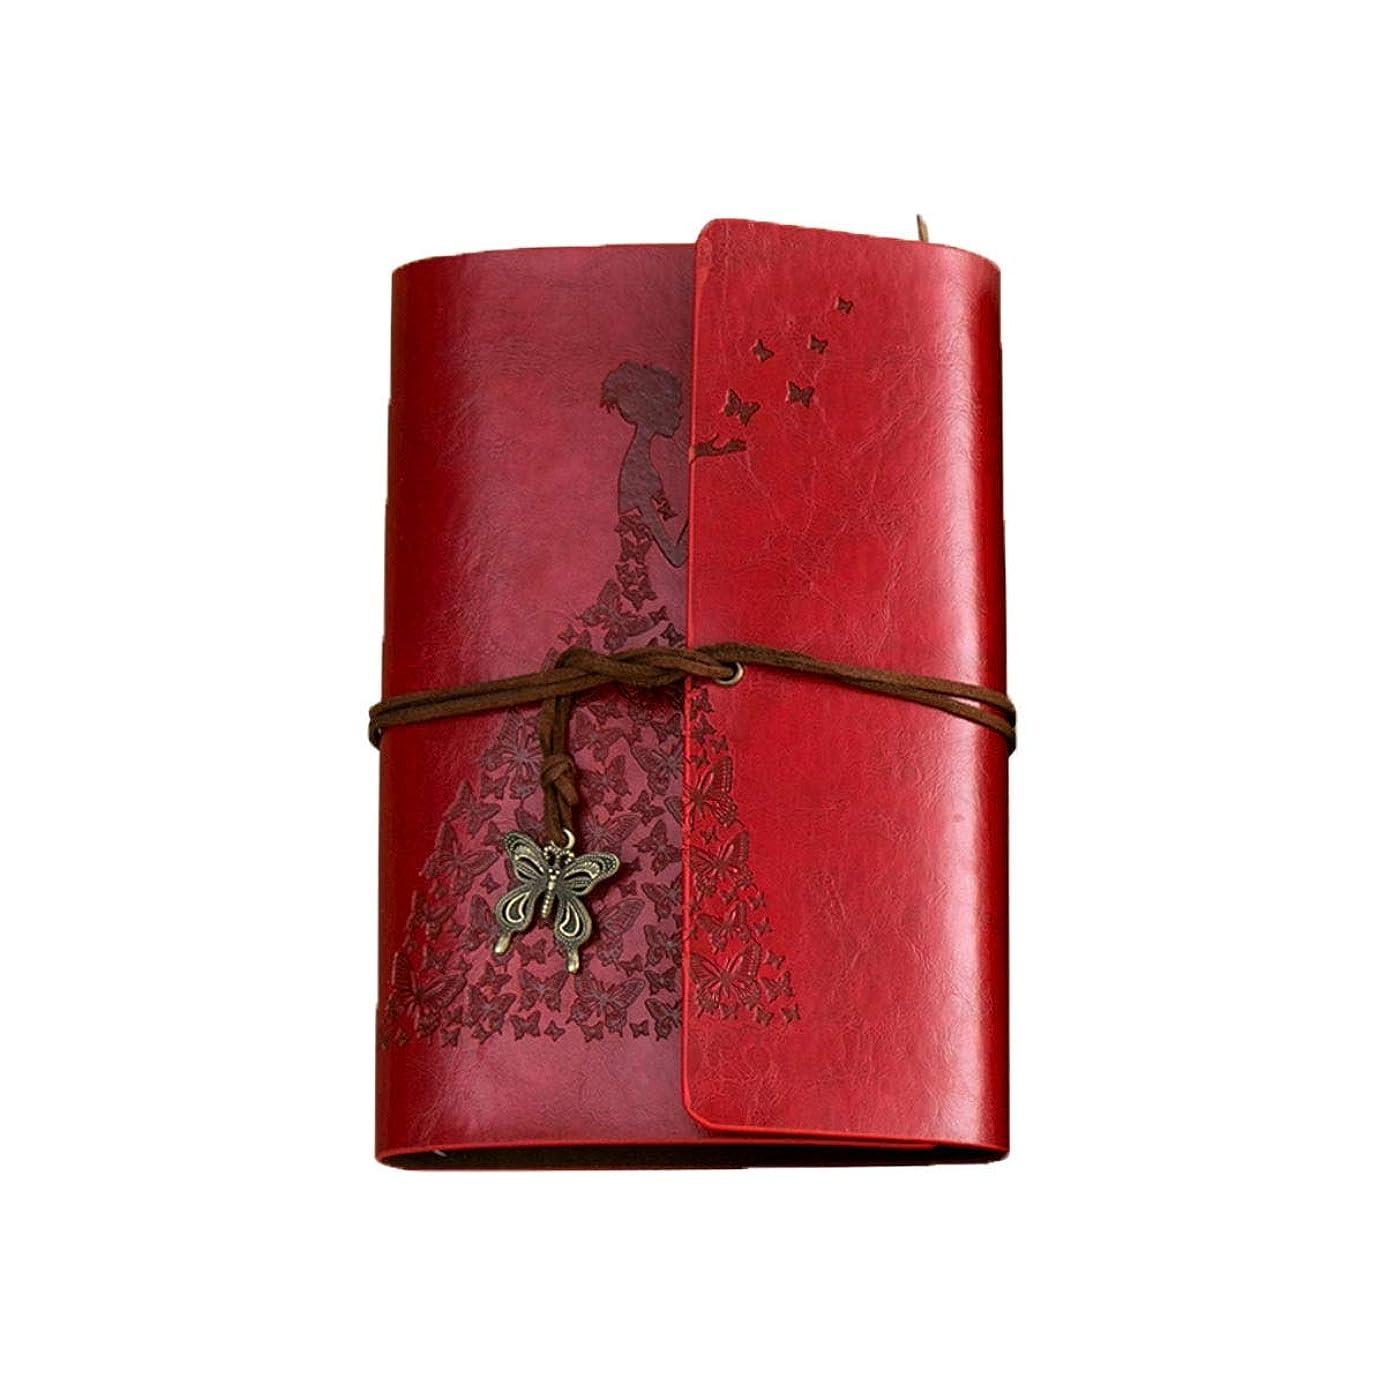 Hengtongtongxun ビンテージクラフト紙メモ帳、クリエイティブ日記日記、ルーズリーフノート、茶色、赤、黄色、青、真鍮 高品質の製品 2 (Color : Red, Style : A)